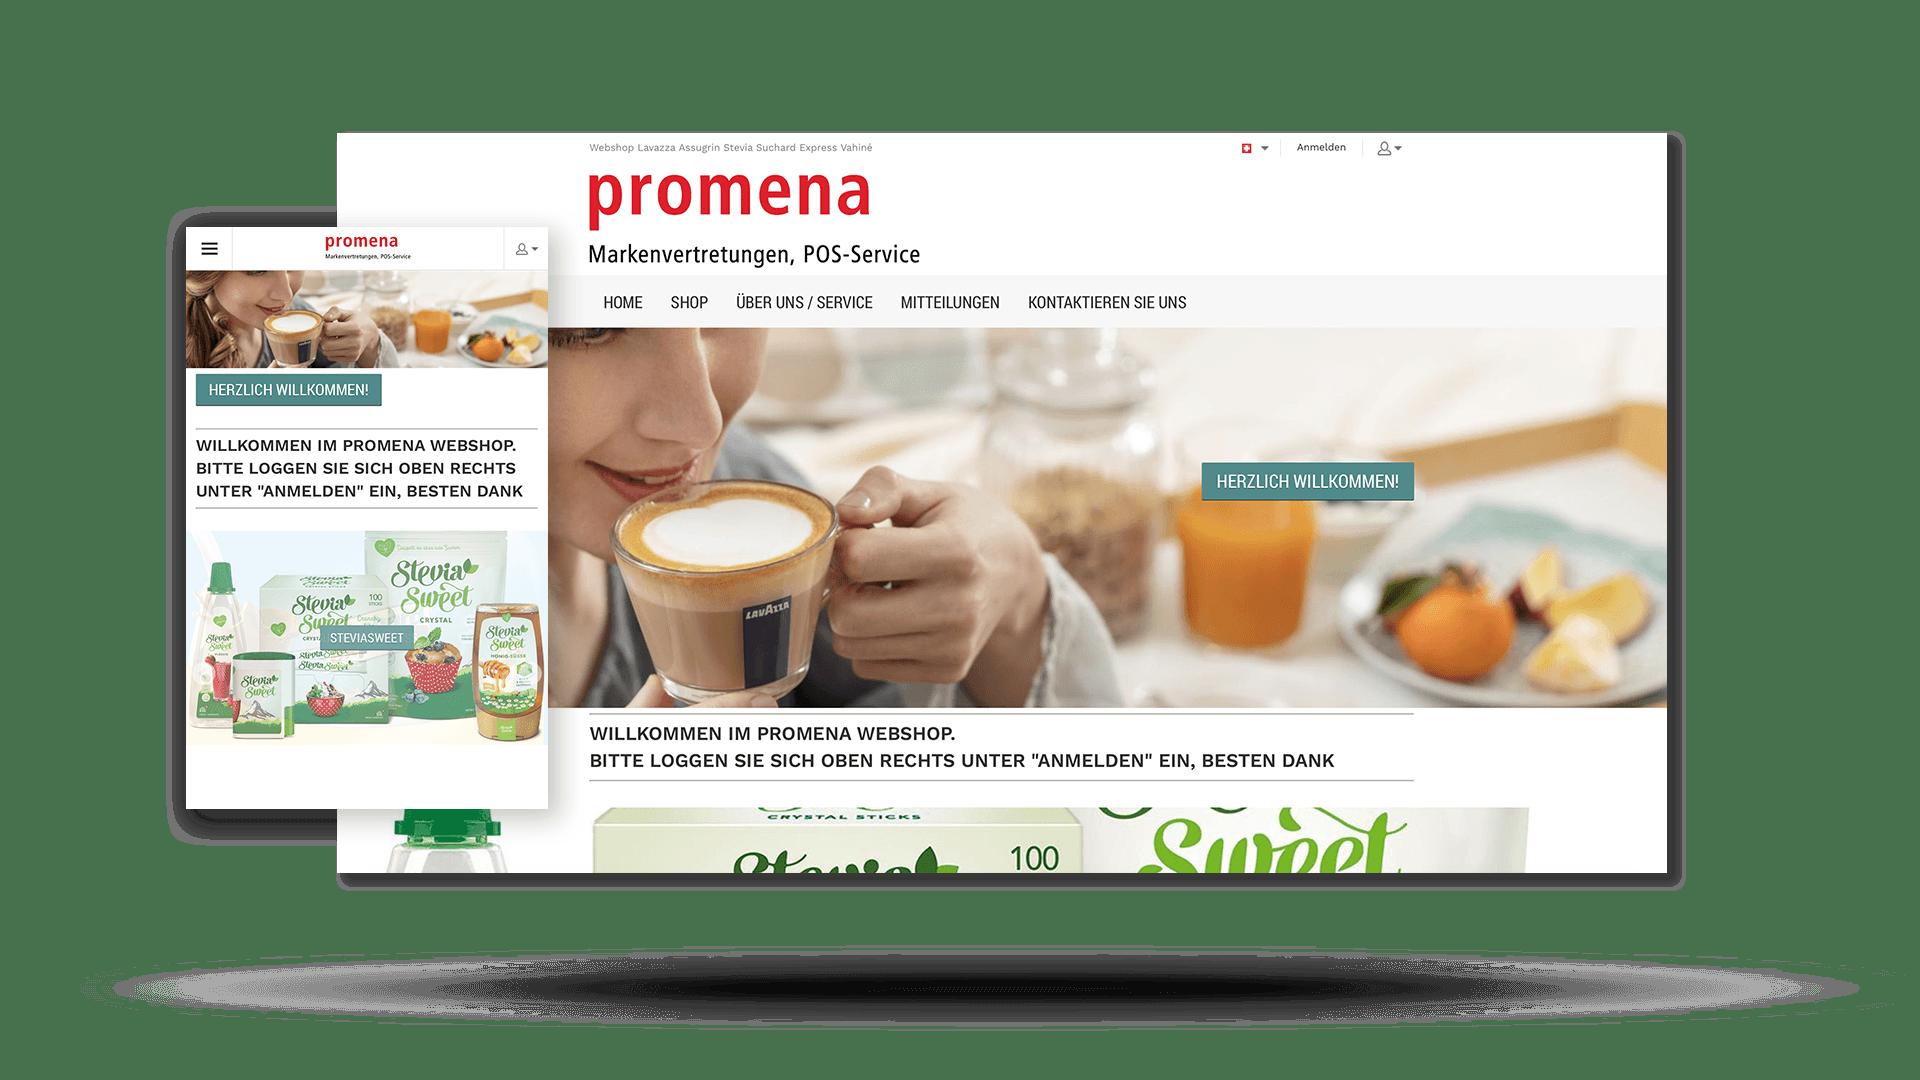 Promena Webshop